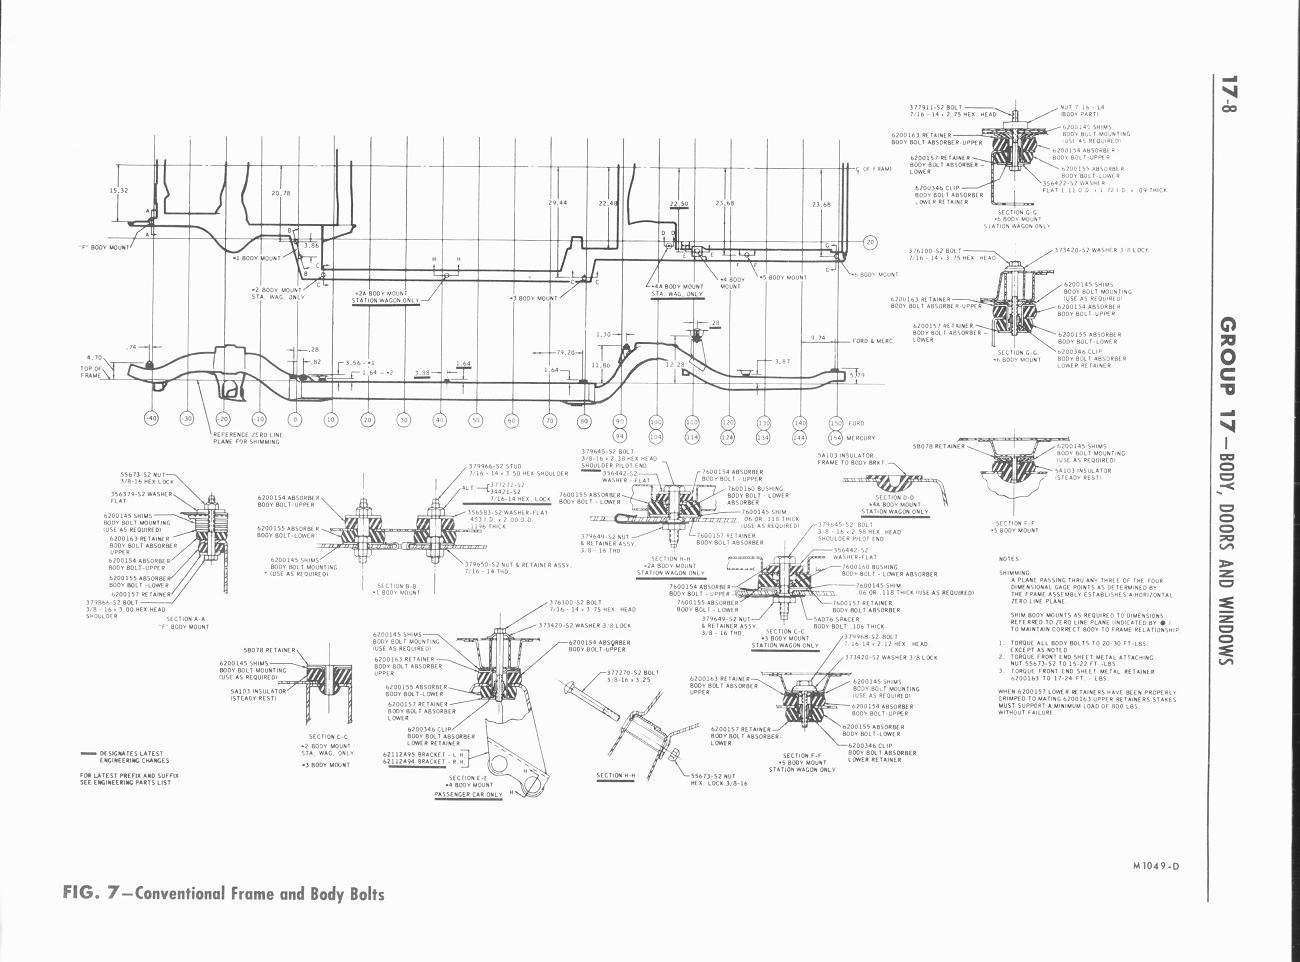 hight resolution of 1962 ford frame diagram wiring diagram schematics rh ksefanzone com 1960 ford 1962 ford galaxie